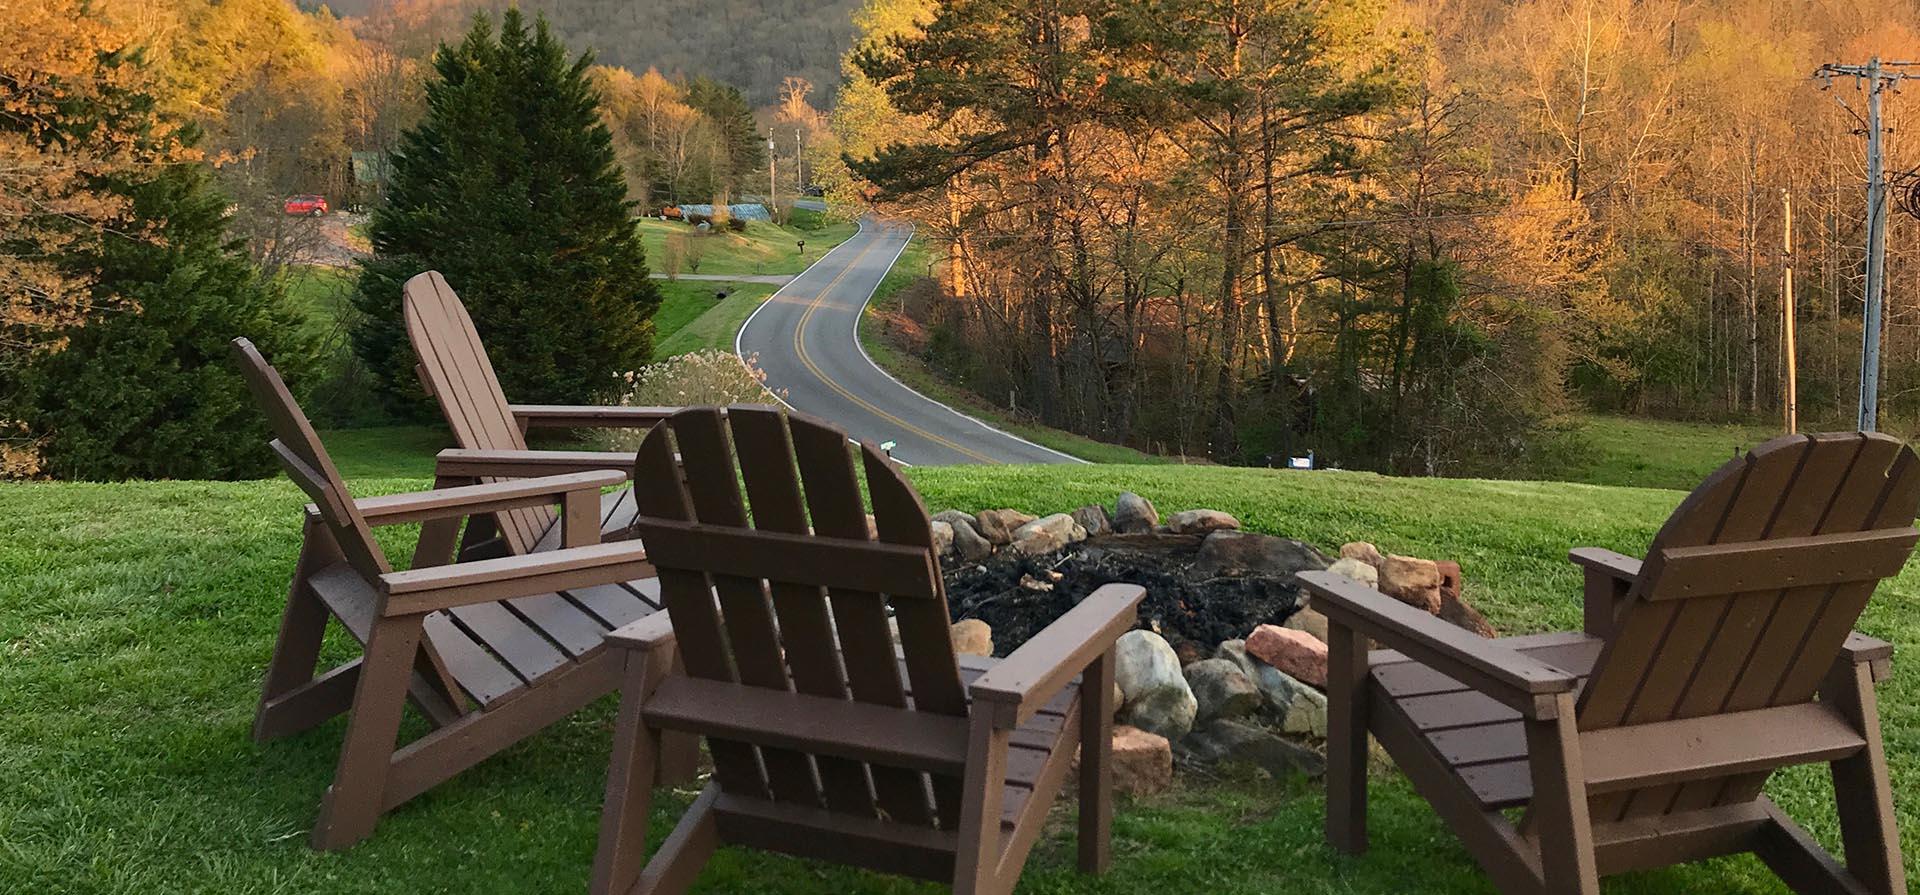 Mountain View Campground | Camping in Hiawassee, GA